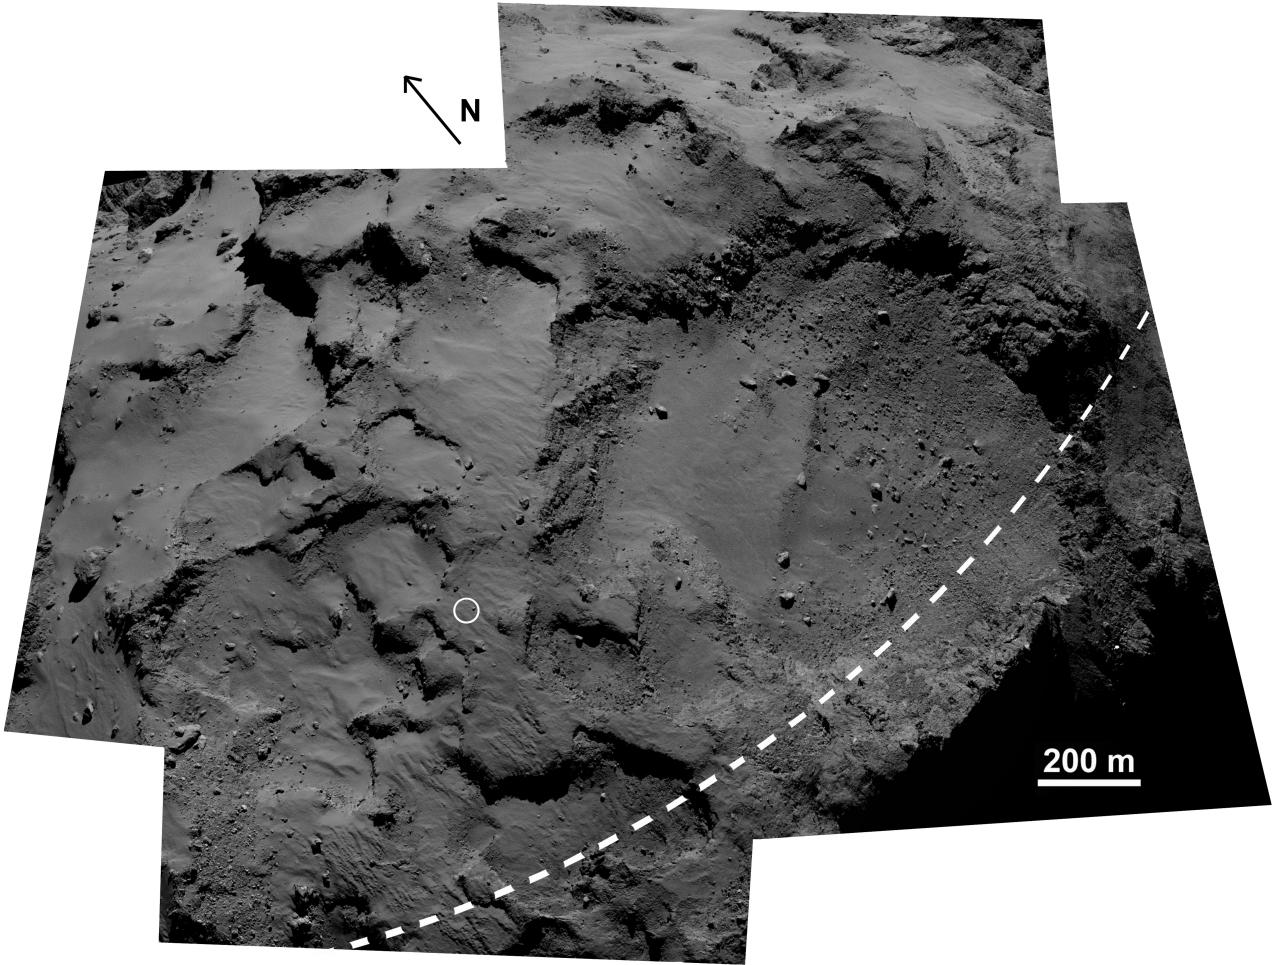 1567215591930-Rosetta_OSIRIS_Agilkia_LaForgia_Fig2_1280.jpg